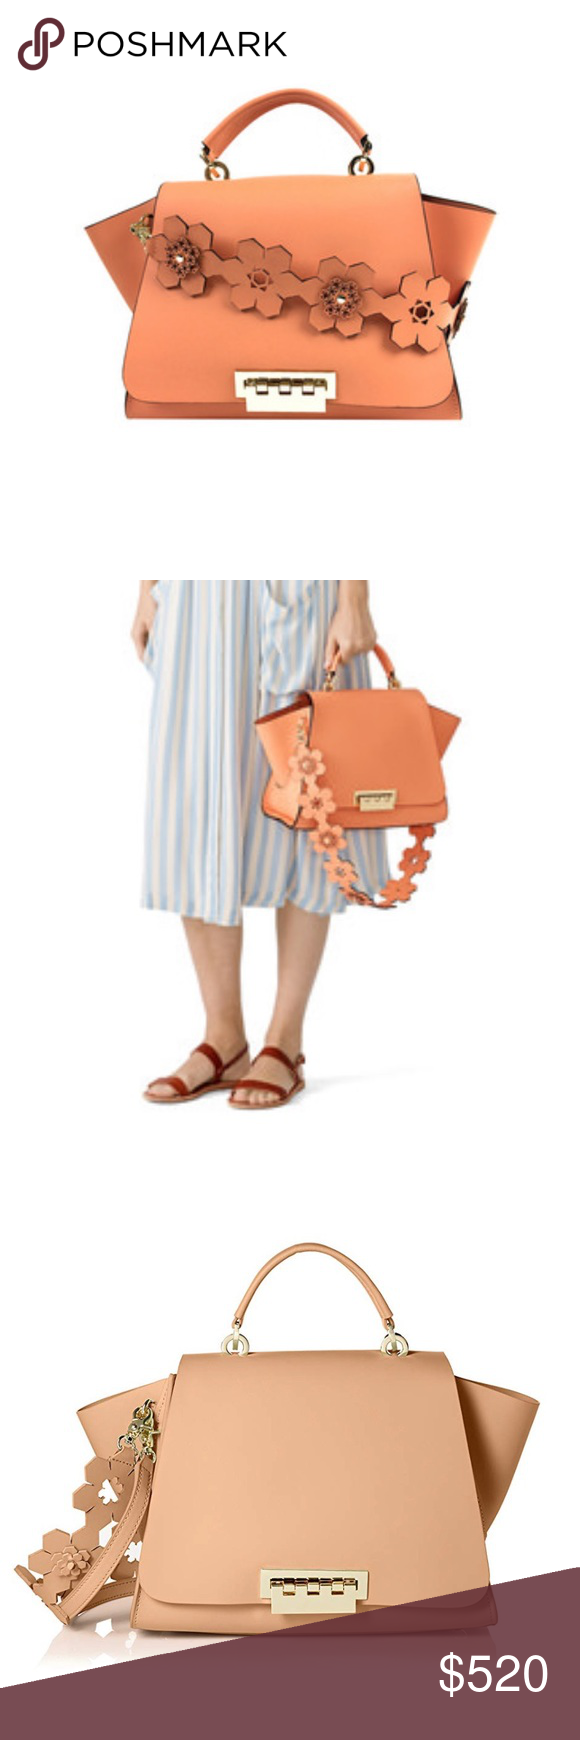 Zac Posen Coral Eartha Iconic Soft Top Handle Bag Never